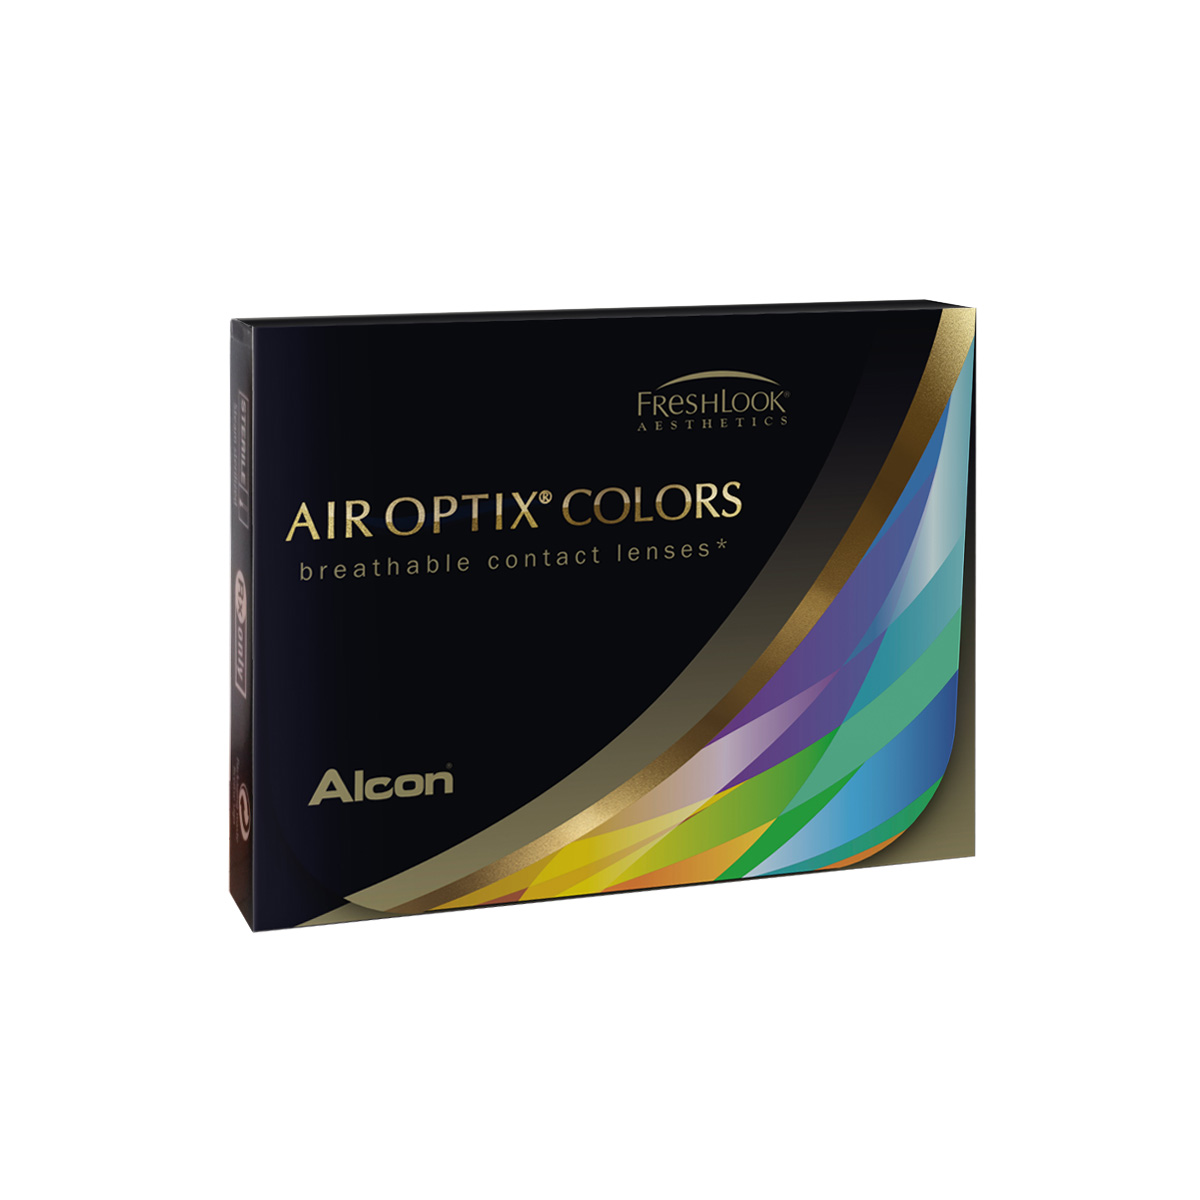 Lenstore Air Optix Colors (2 lenses)